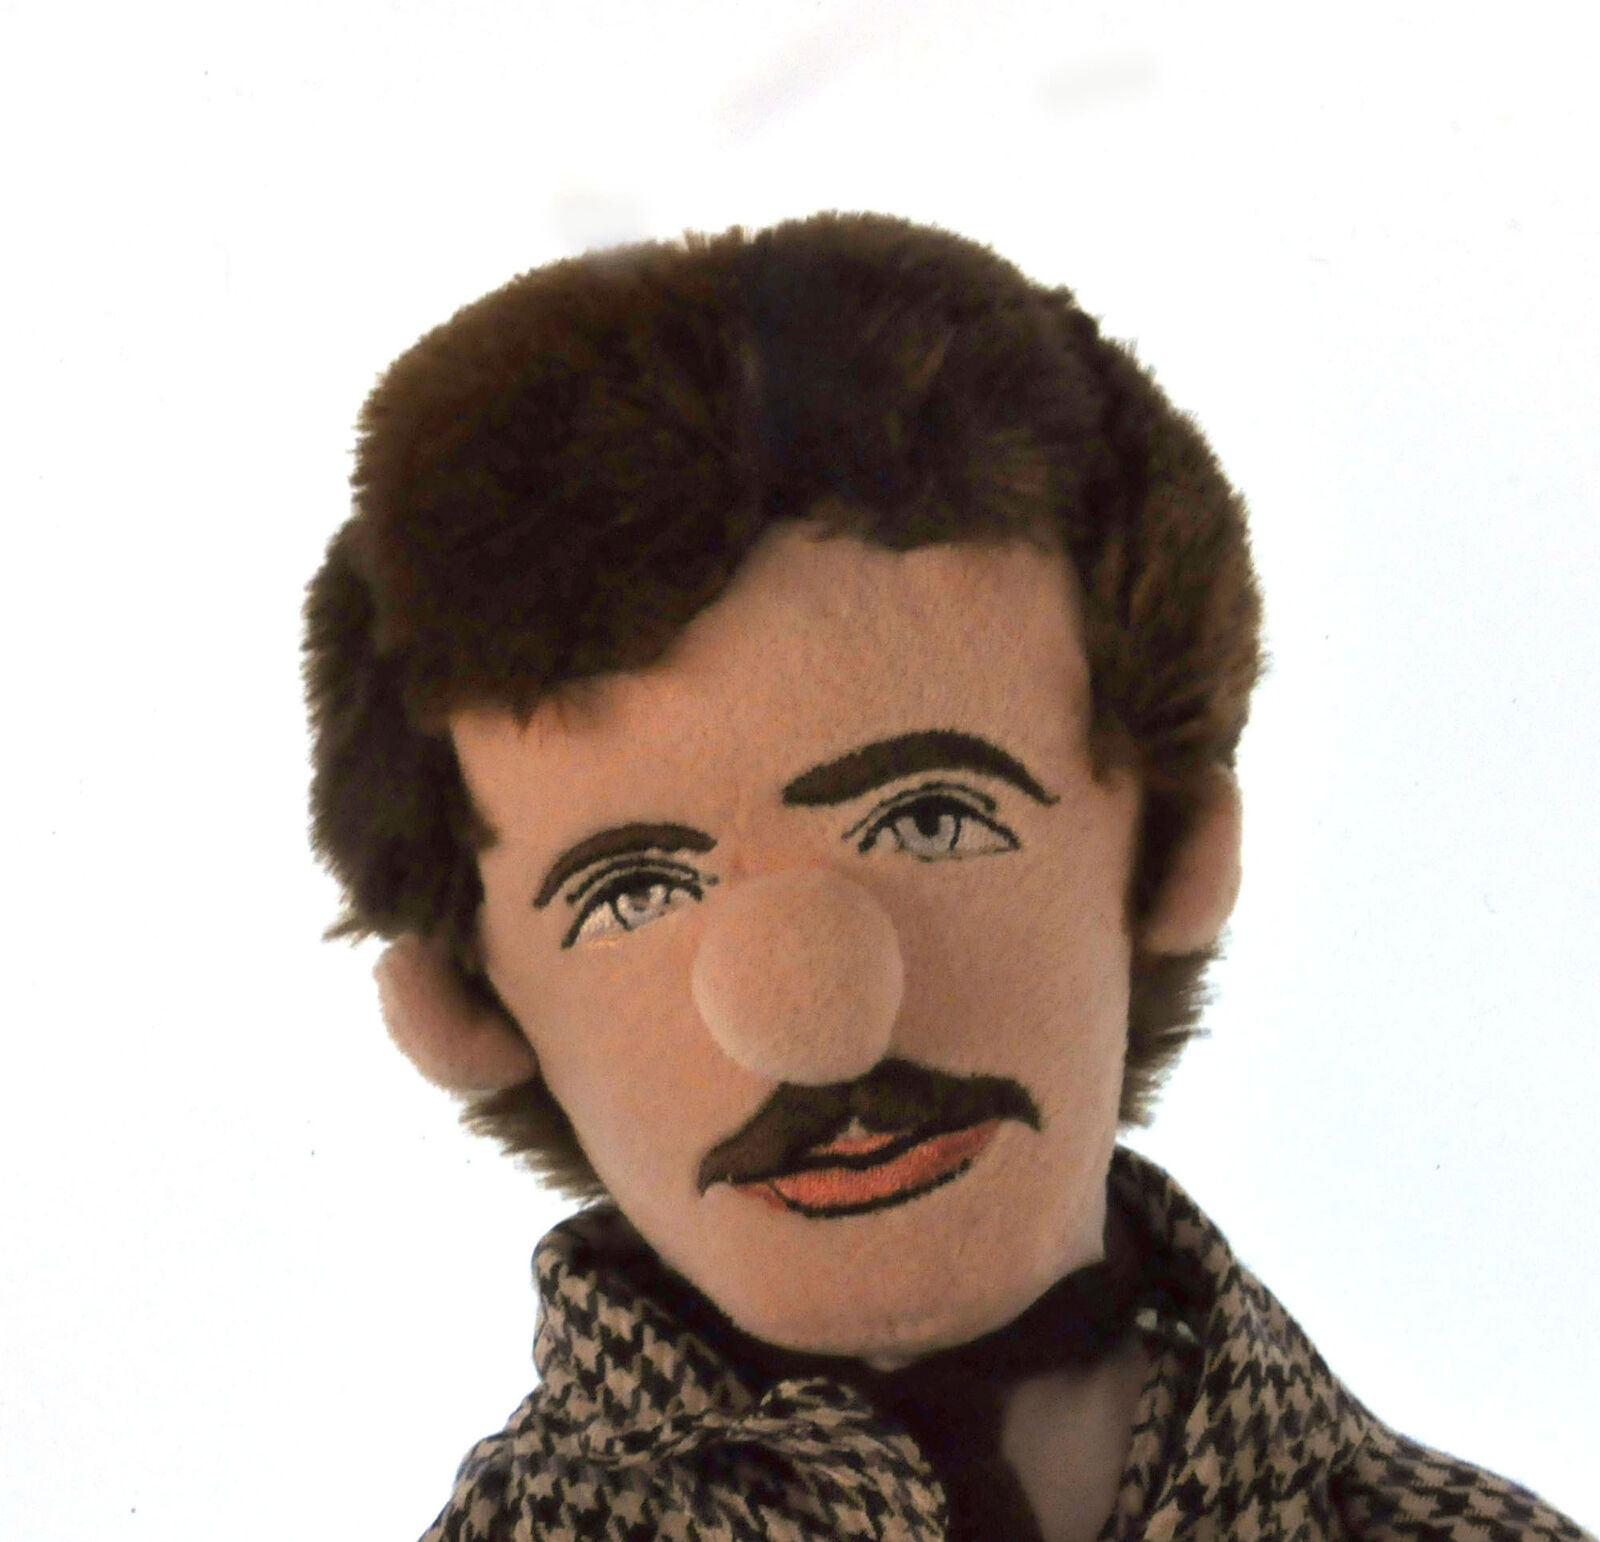 Nikola Tesla Giocattolo Morbido - Little Thinkers Bambola